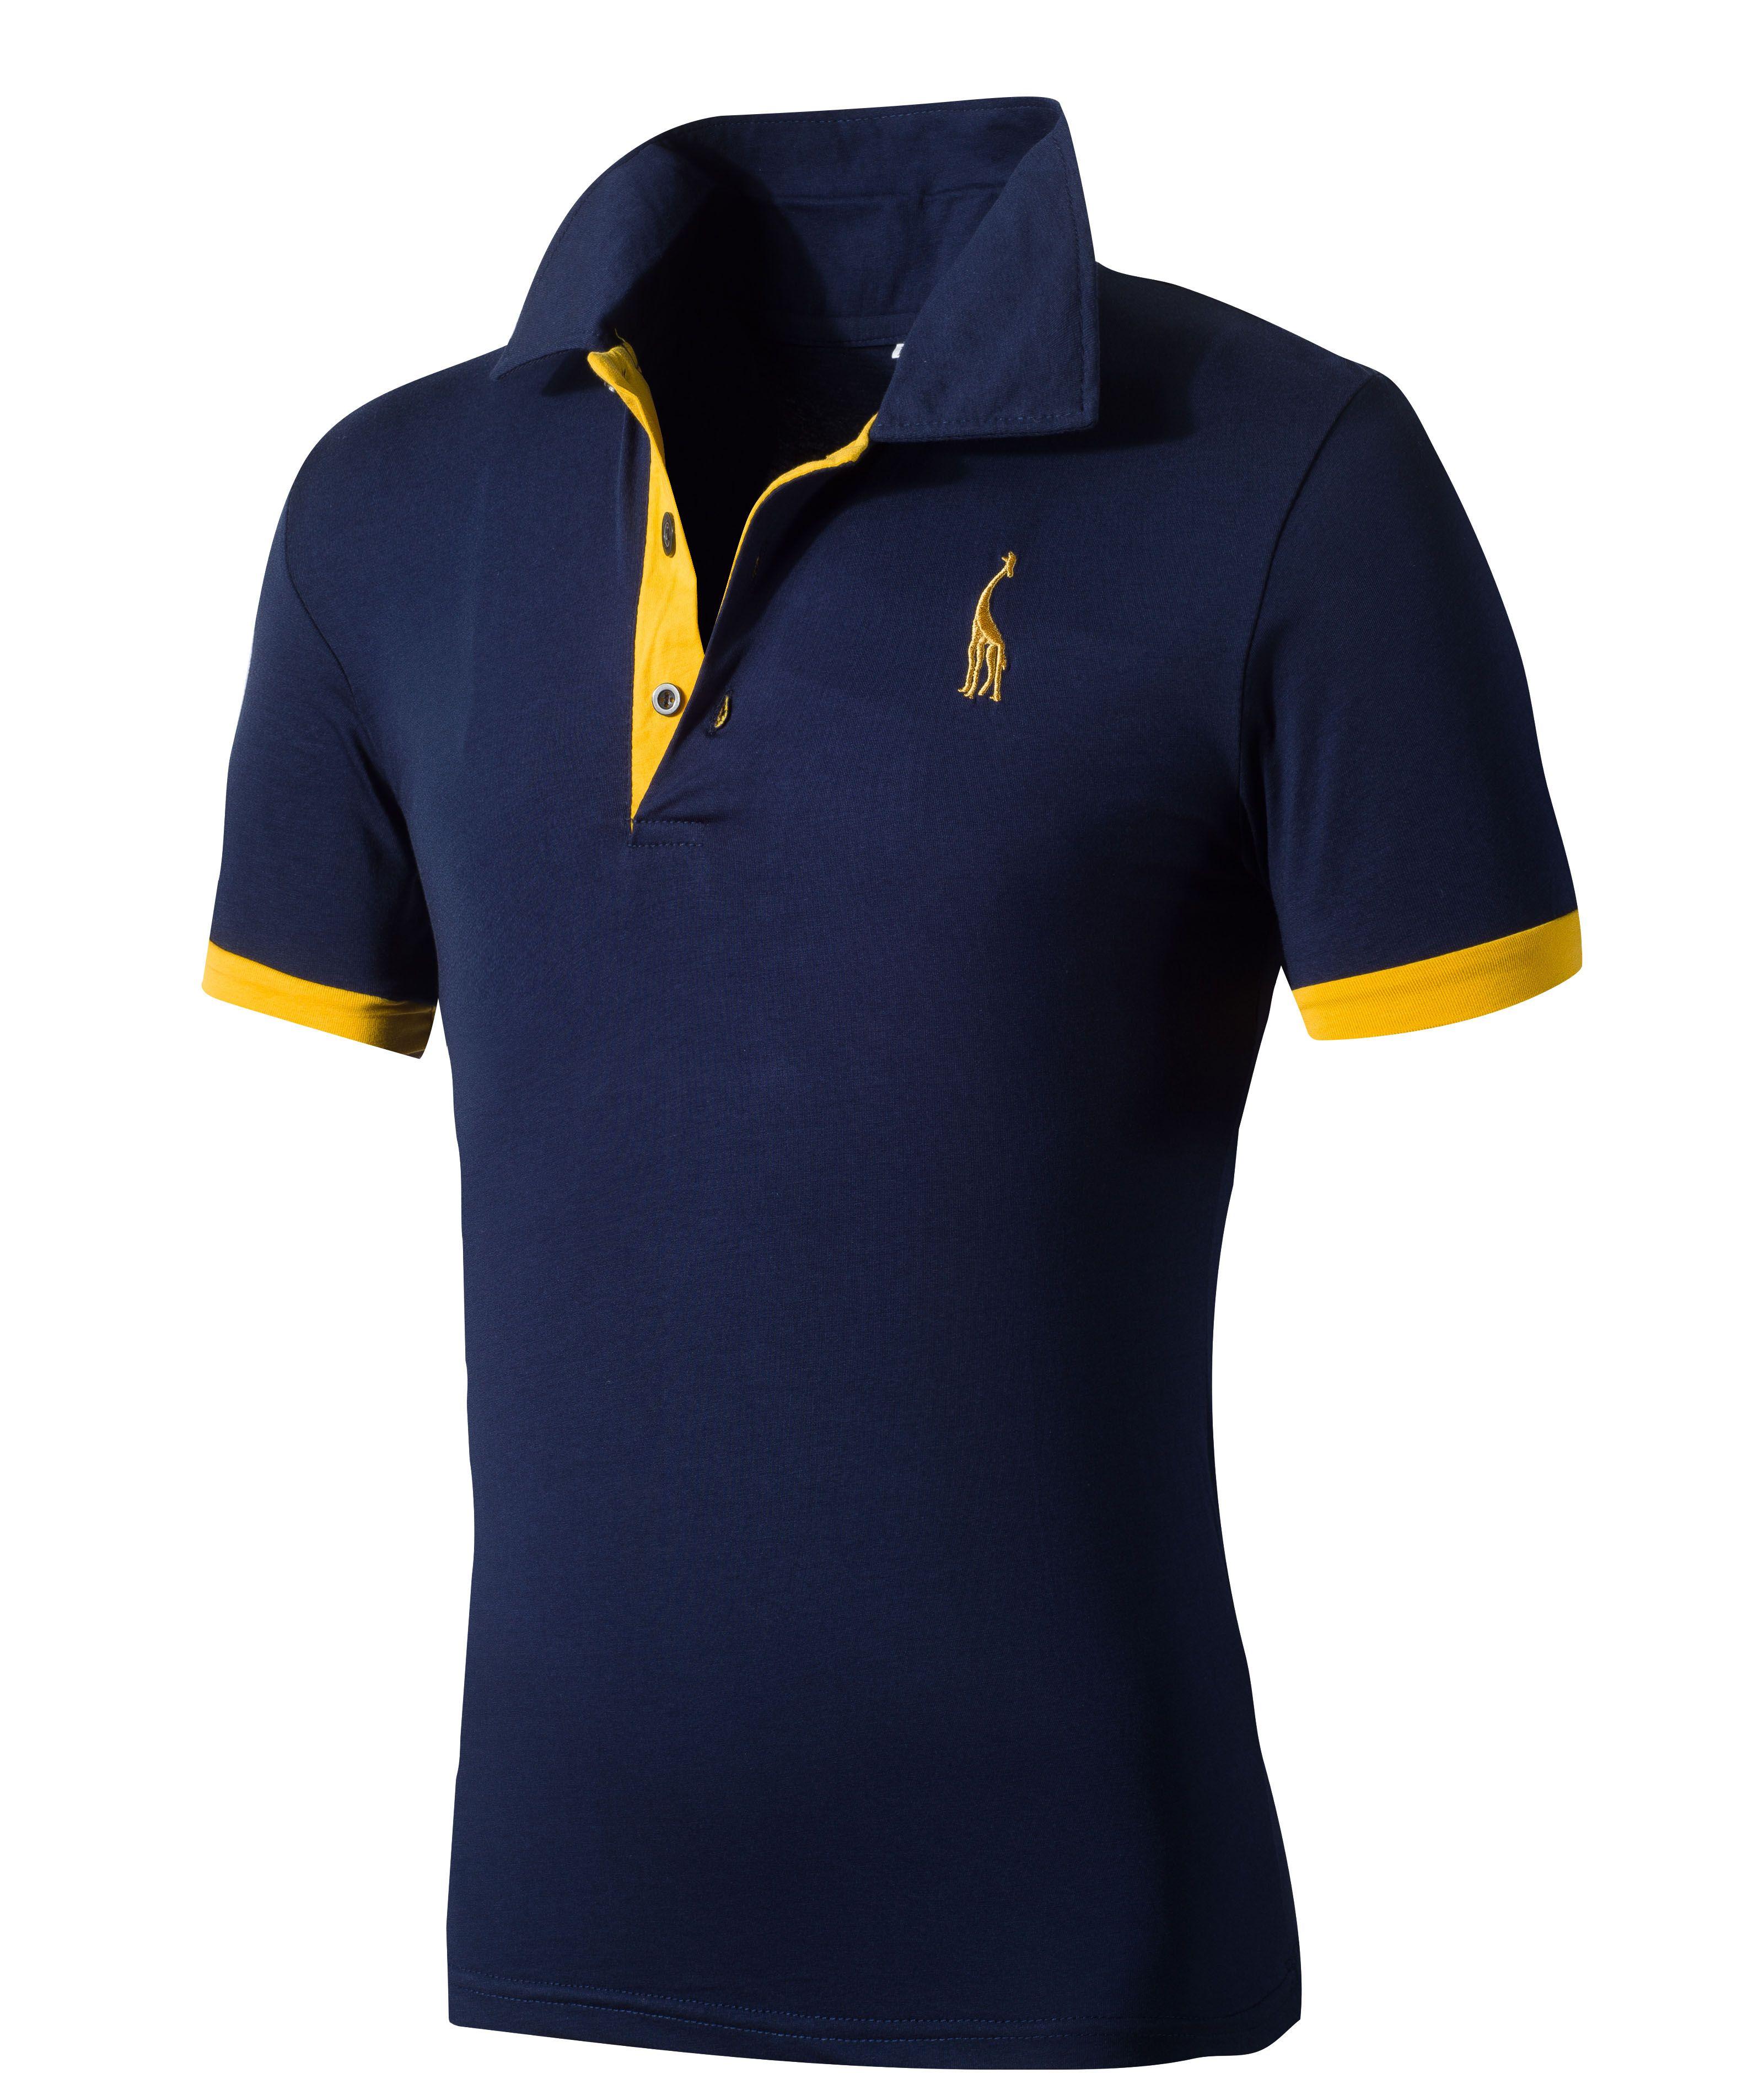 Free Ship New 2016 Fashion Short Sleeve T Shirt Summer Top Tees ...